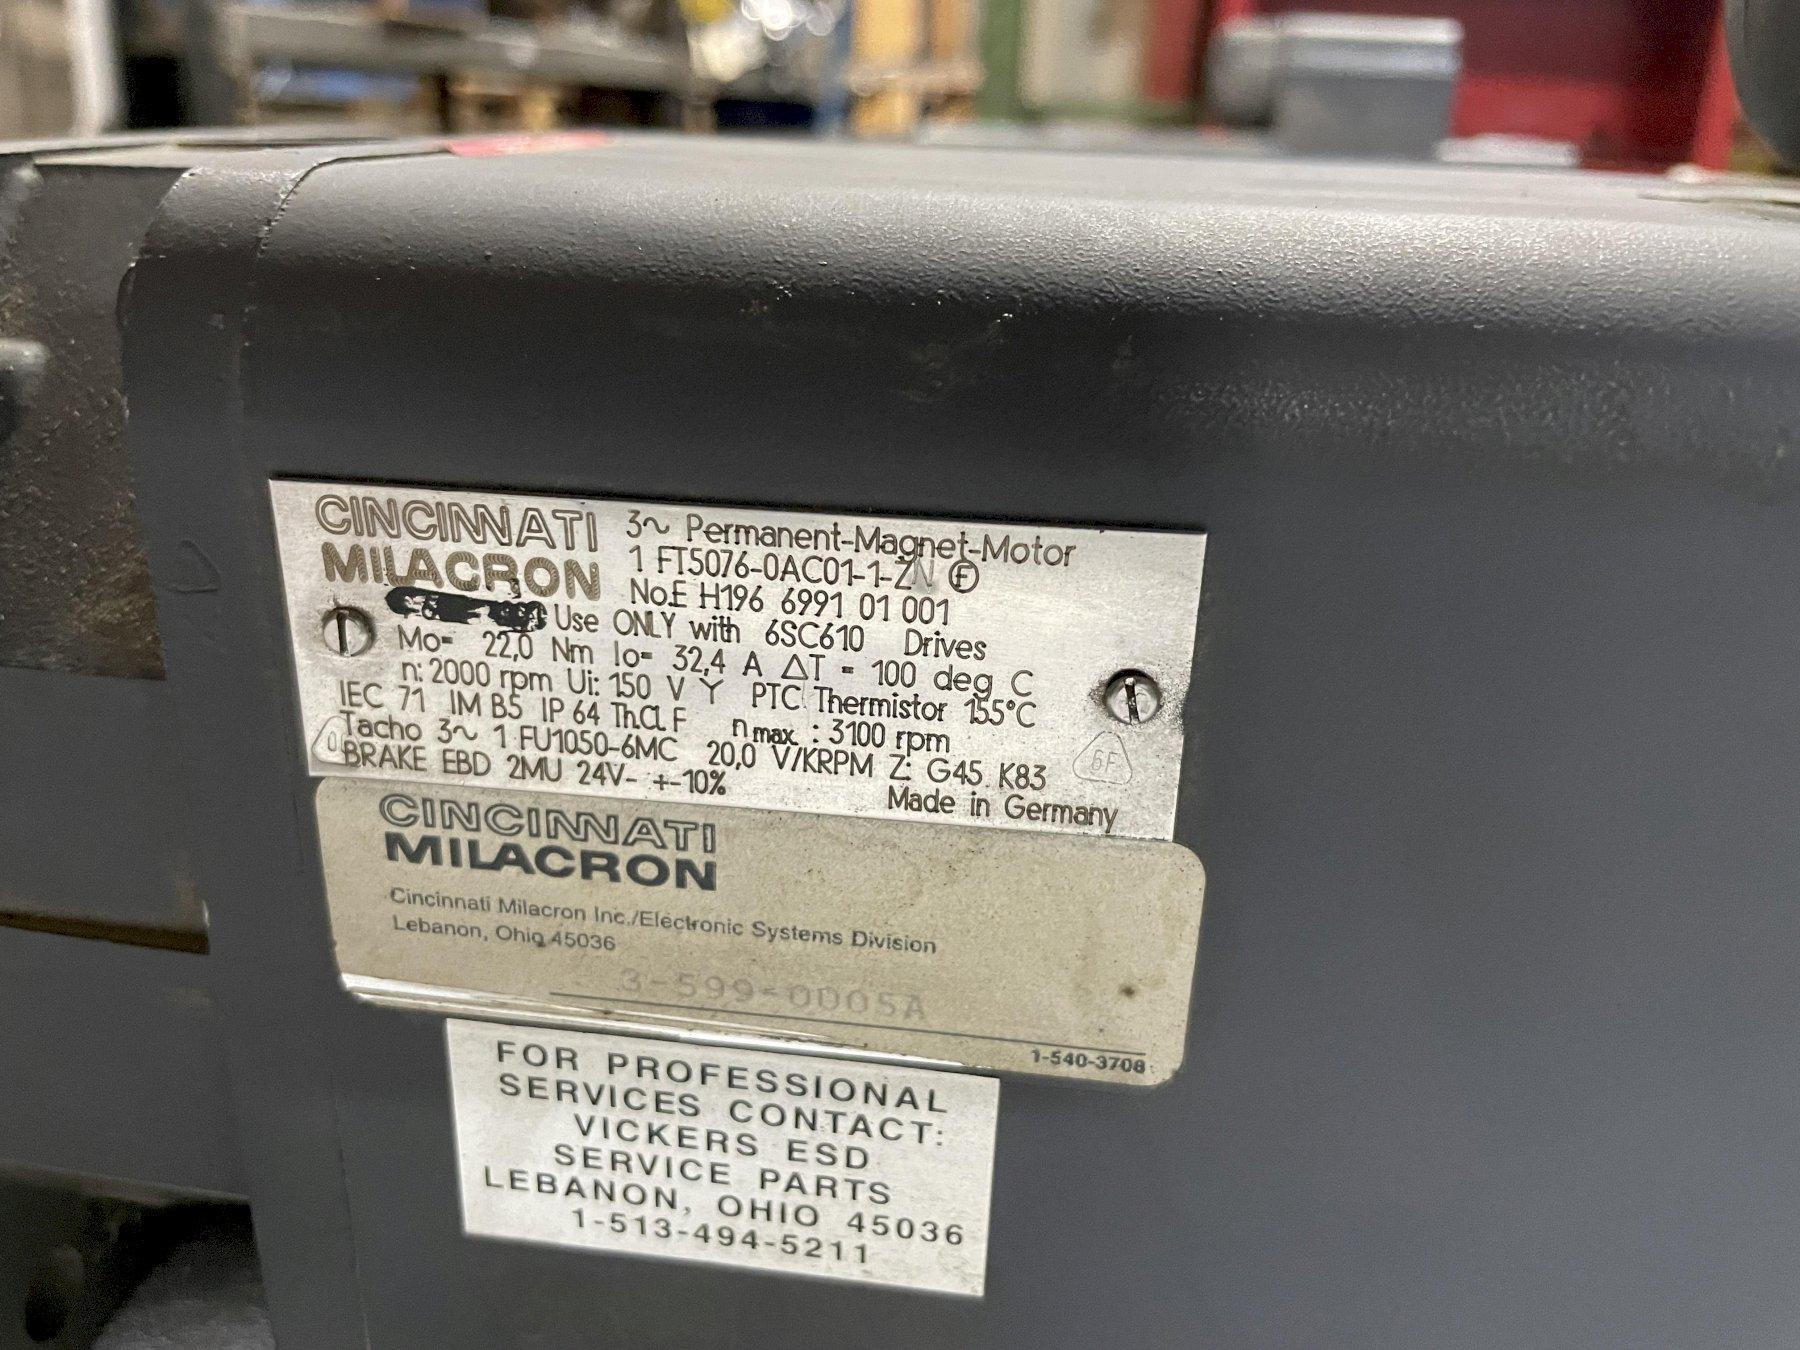 SIEMENS/CINCINNATI MILACRON SERVO MOTOR 1FT5072-0AC01-1-Z Milacron # E H196 6991 01 001. Use only with 6SC610 Drives.